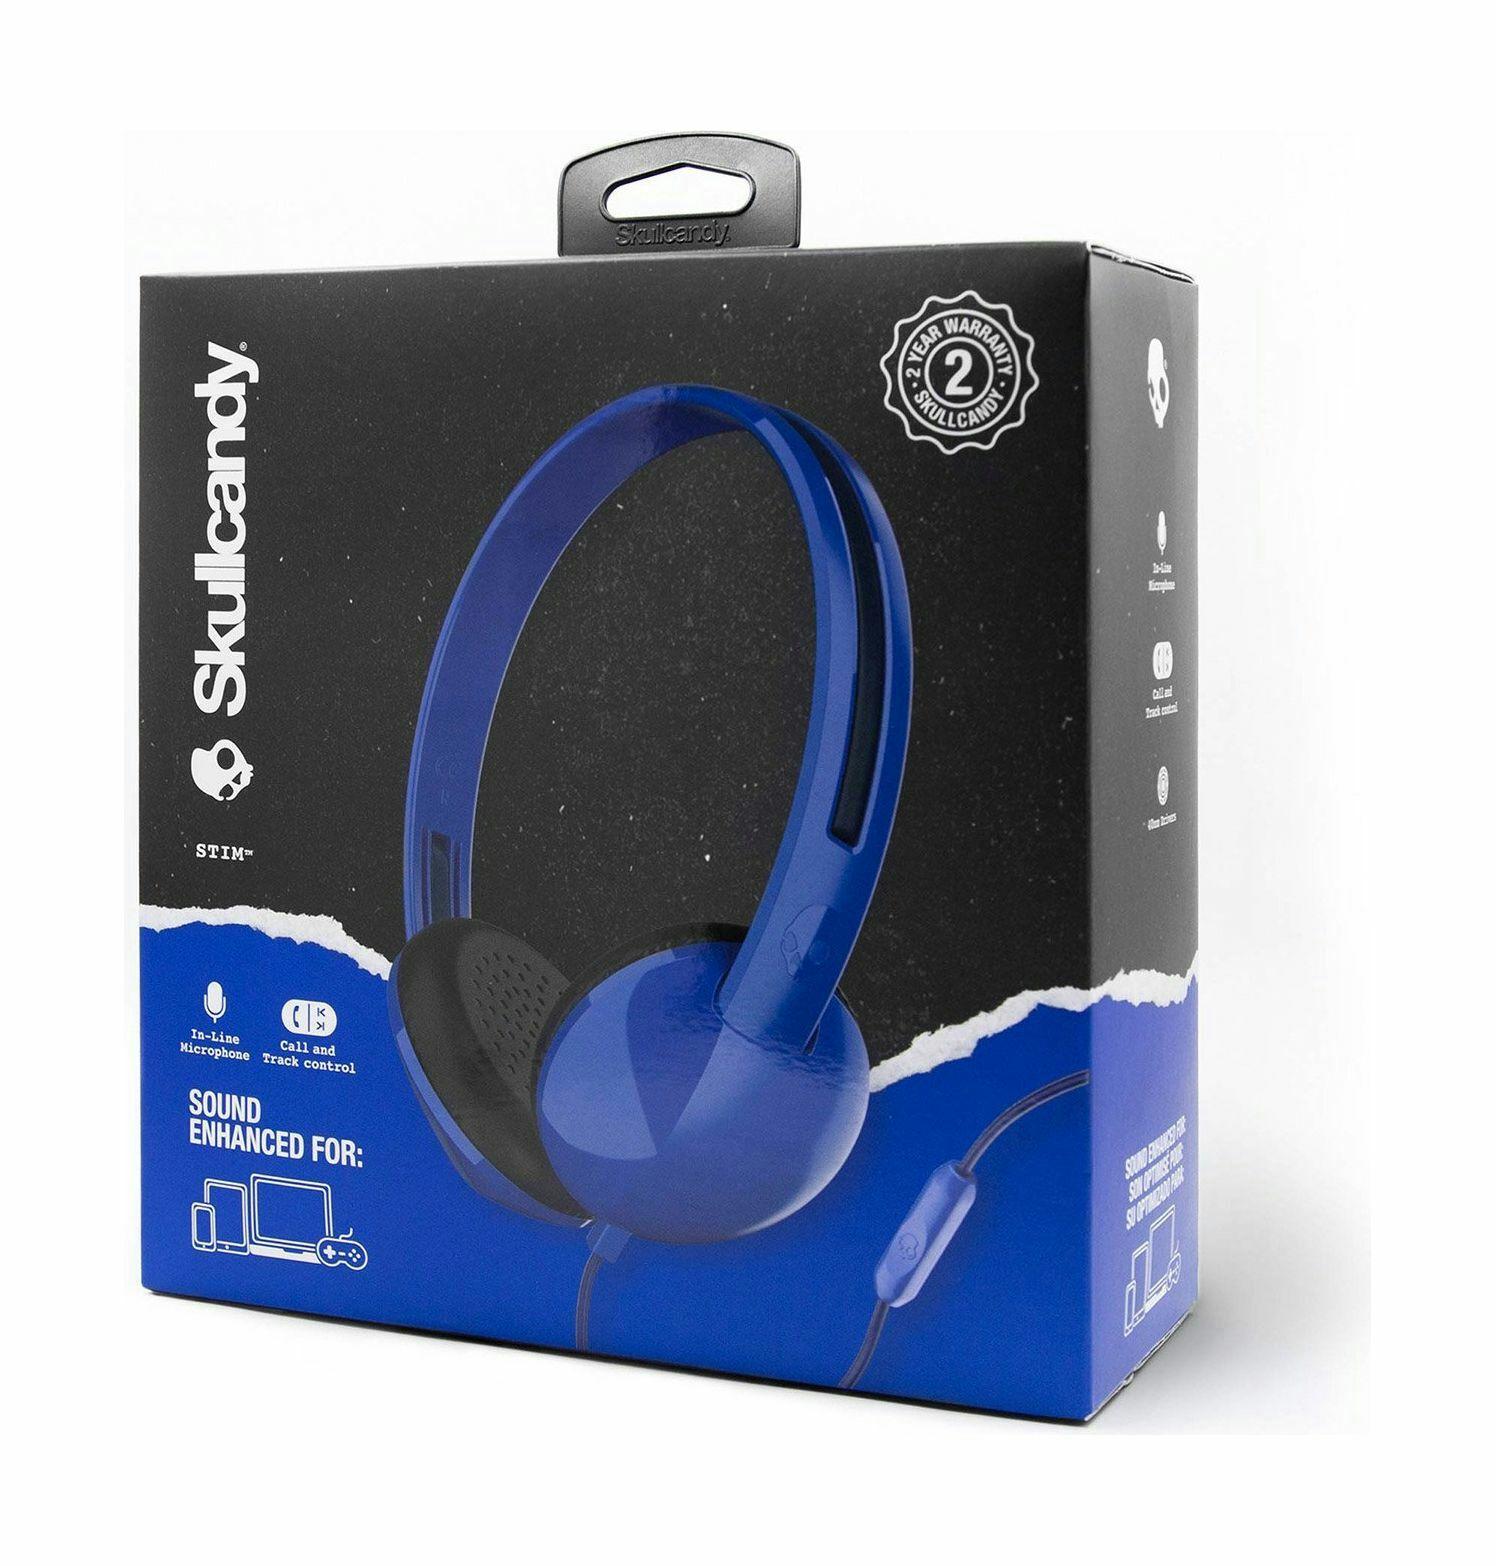 Skullcandy Stim headphones (RTC) £4.25 at Tesco Instore (Loughborough)